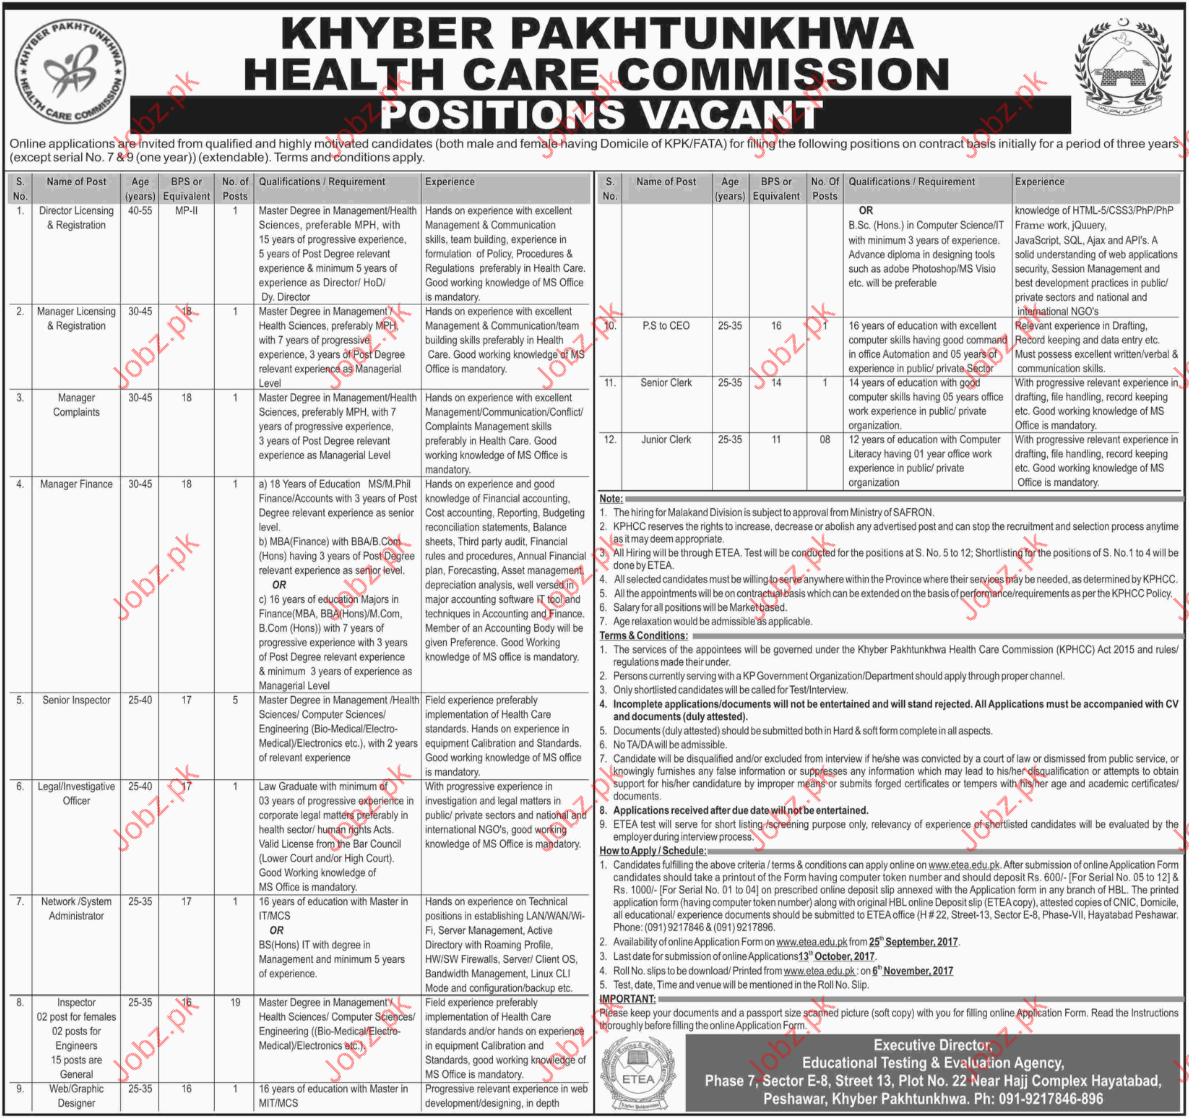 Khyber Pakhtunkhwa Health Care Commission jobs 2017